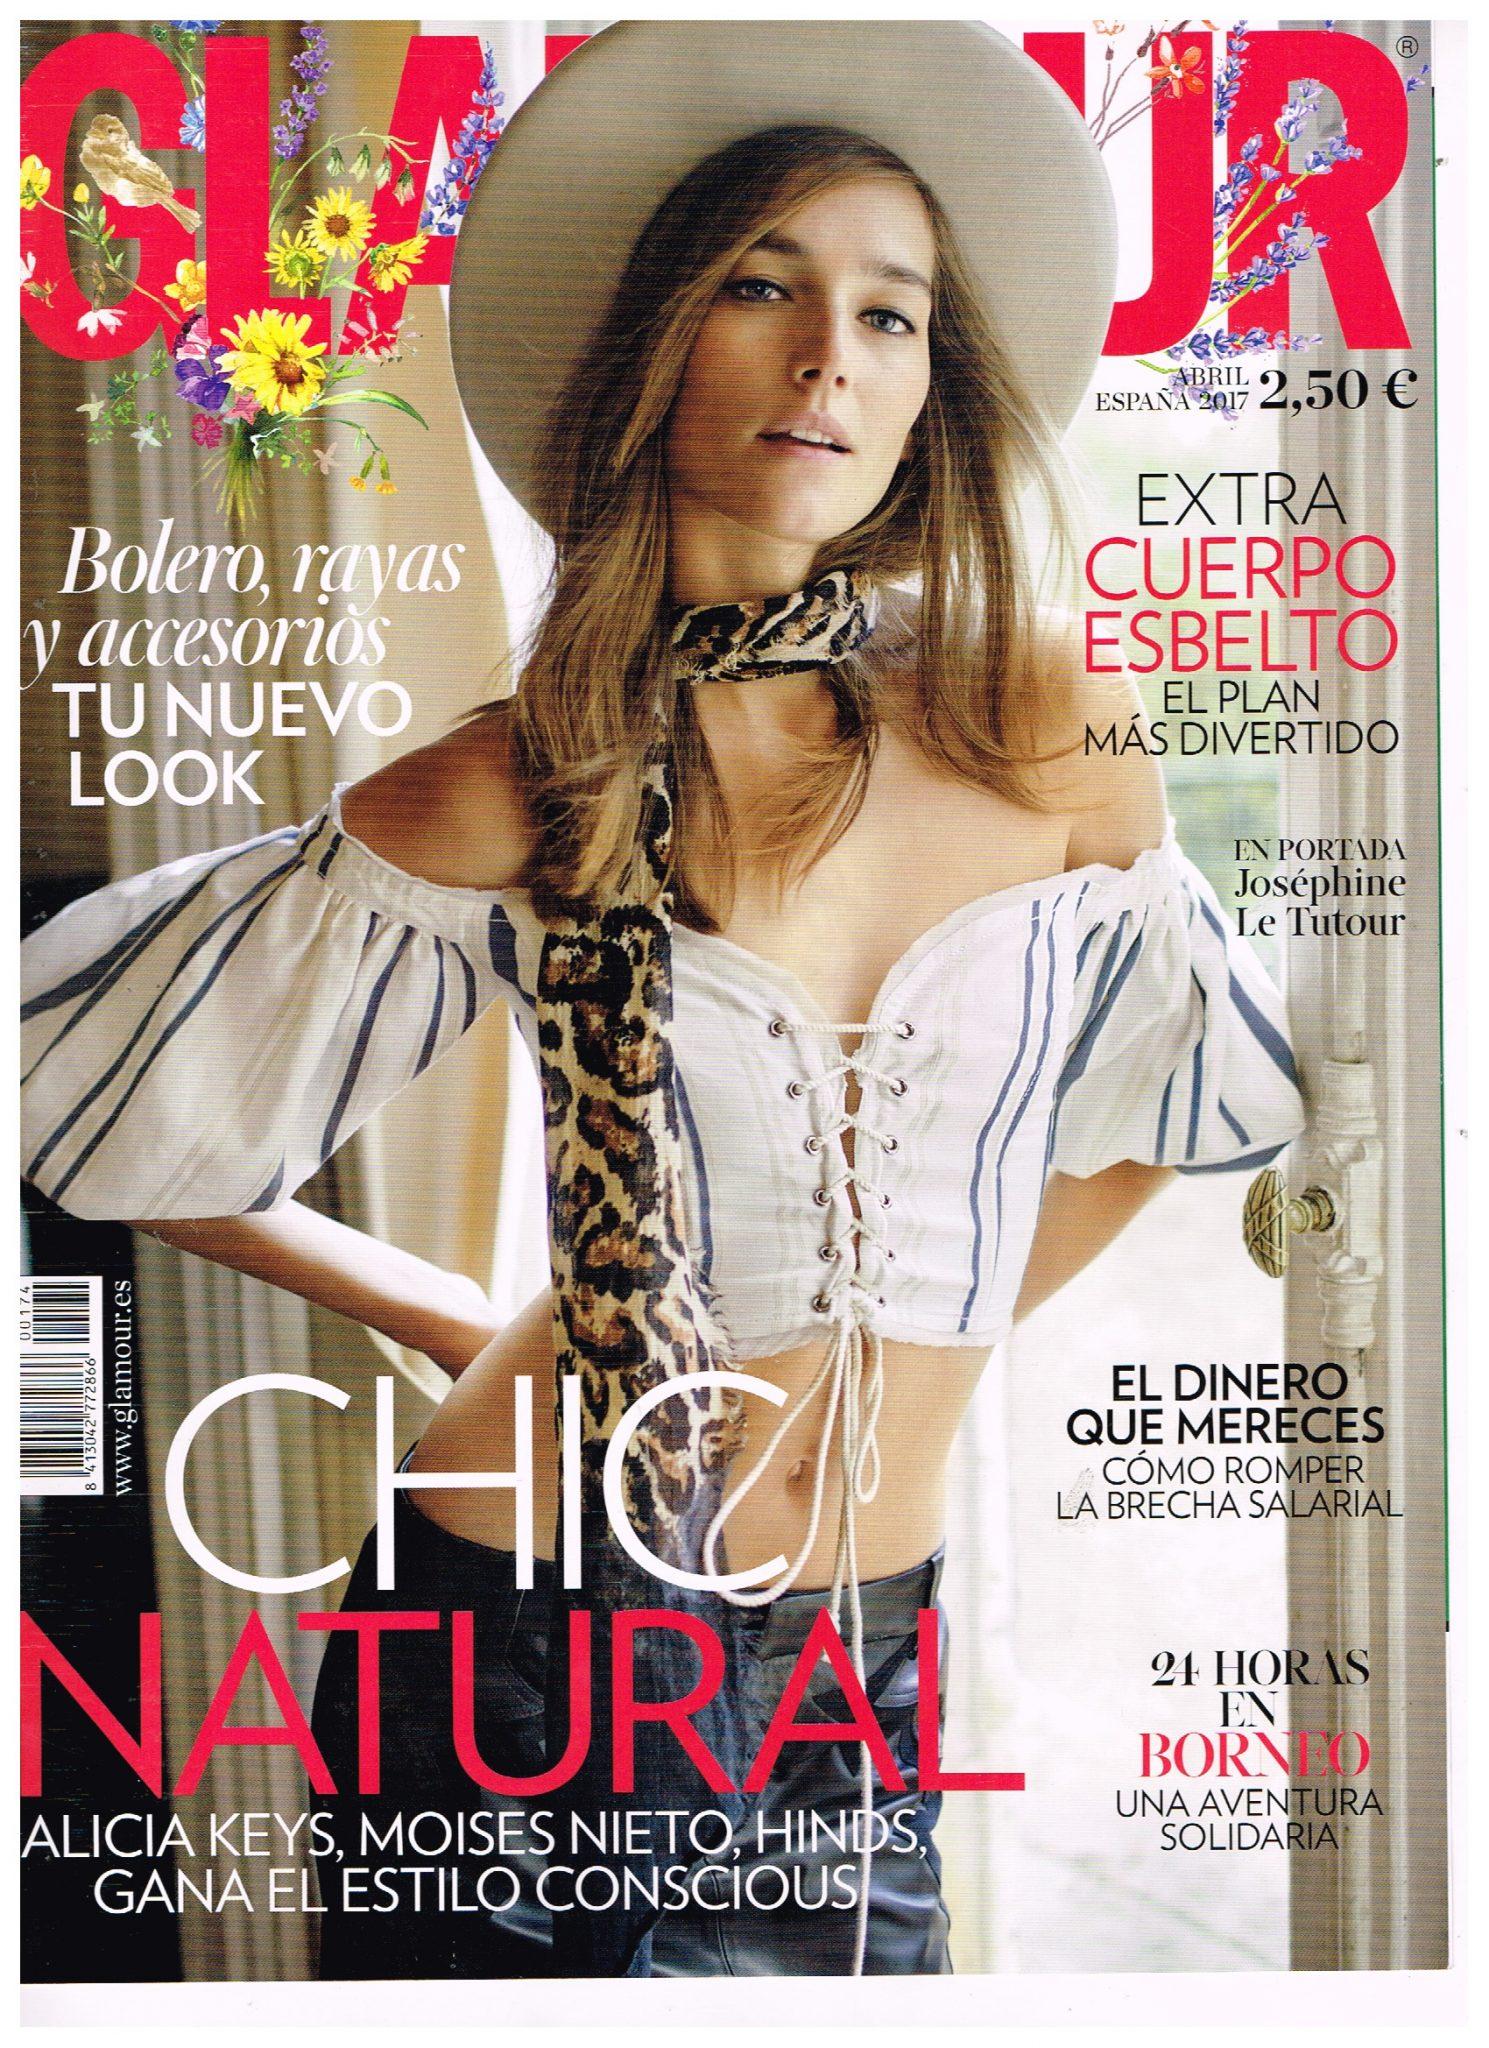 Vitamina C en revista glamour